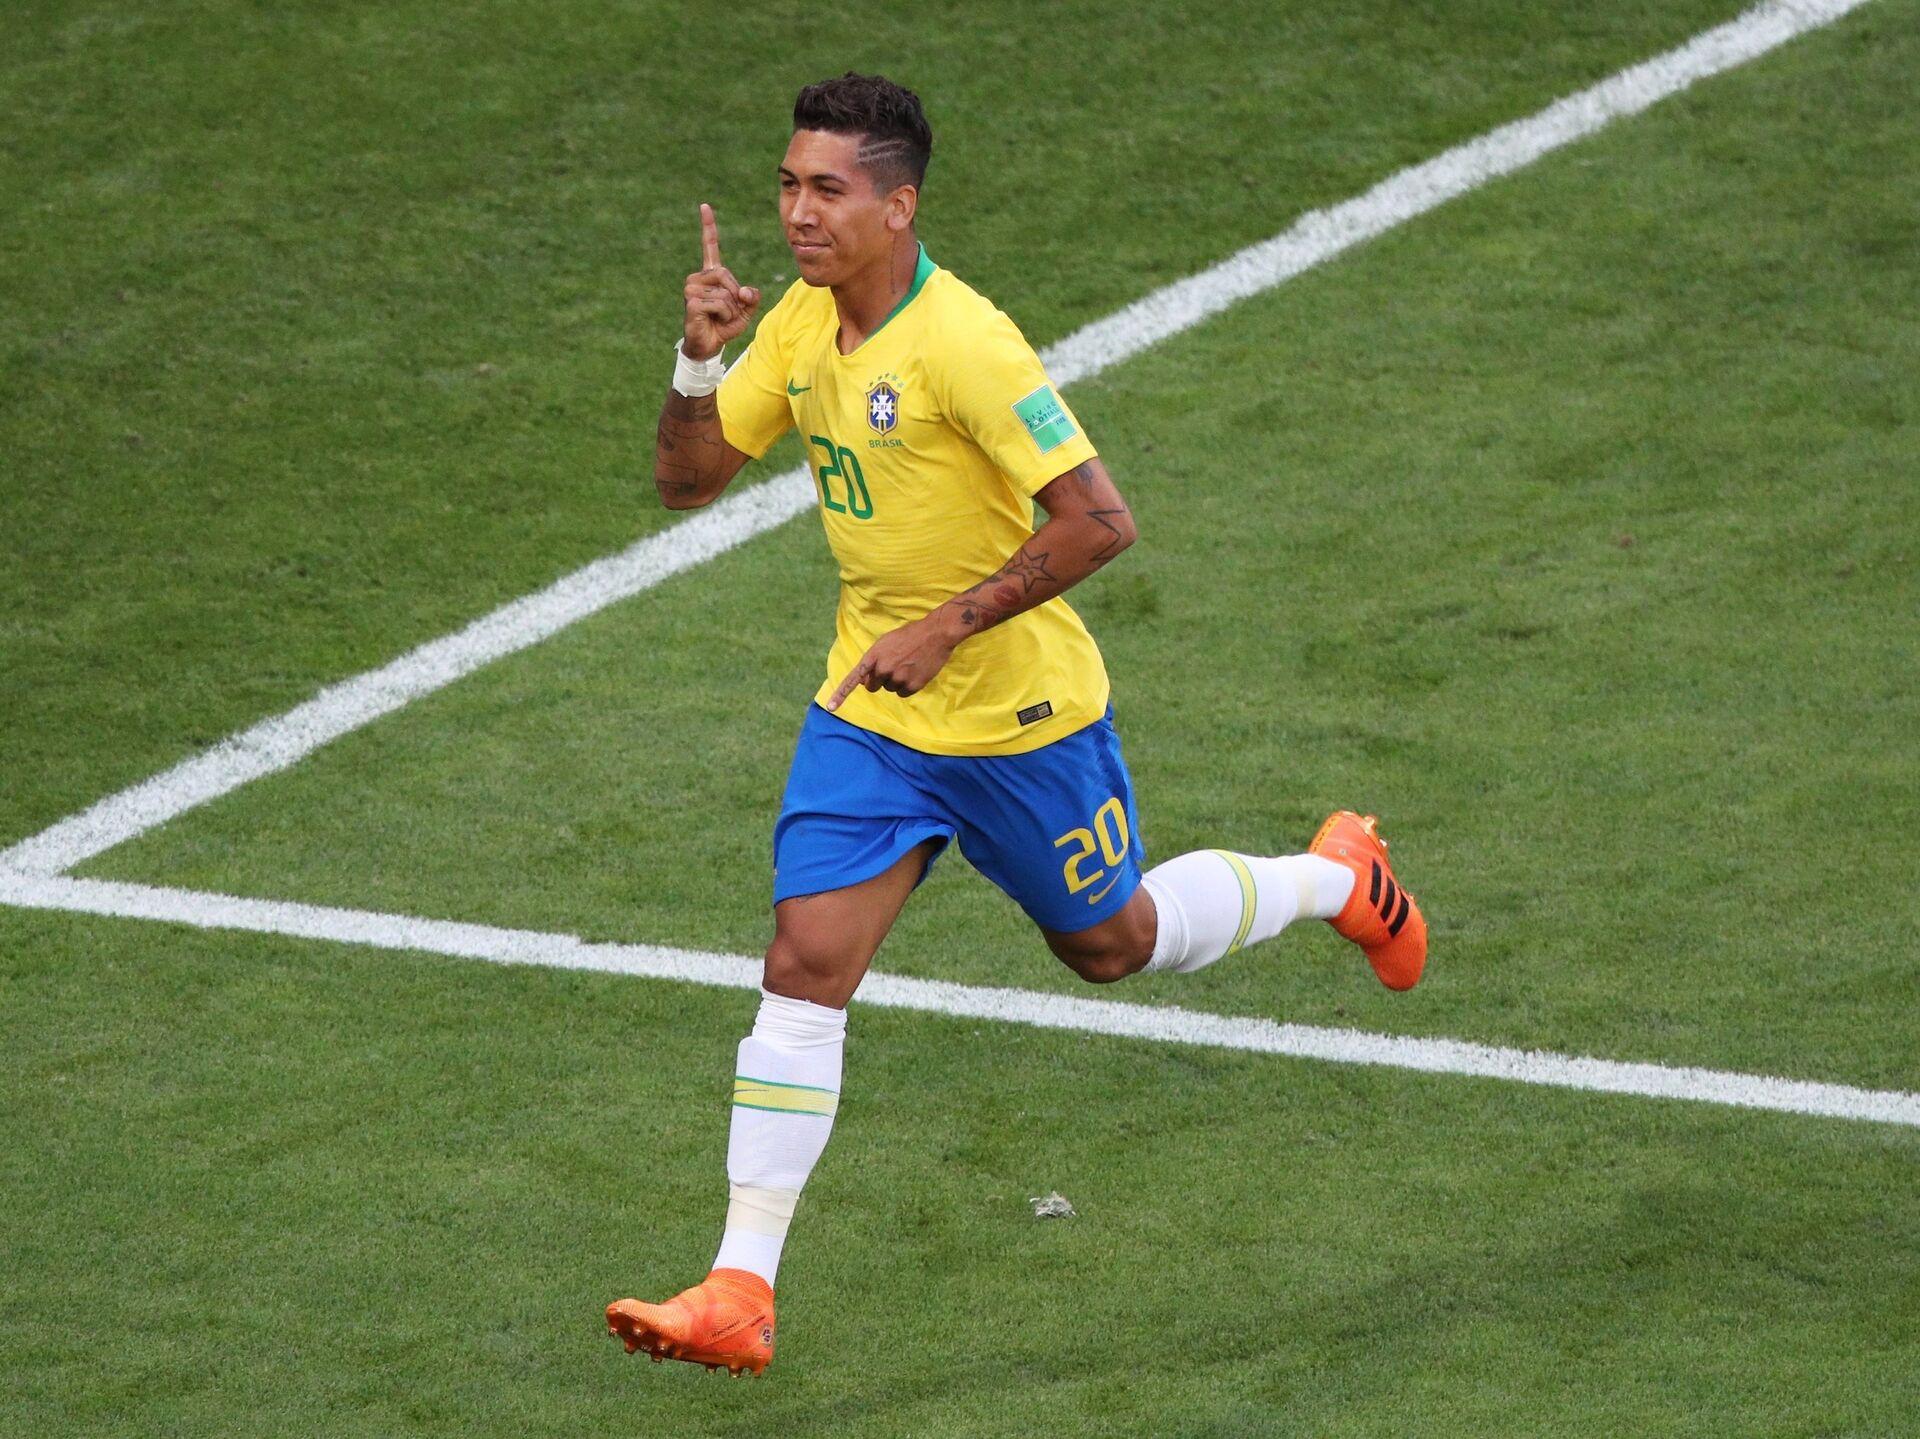 Имена футболистов сборной бразилии по английски имена